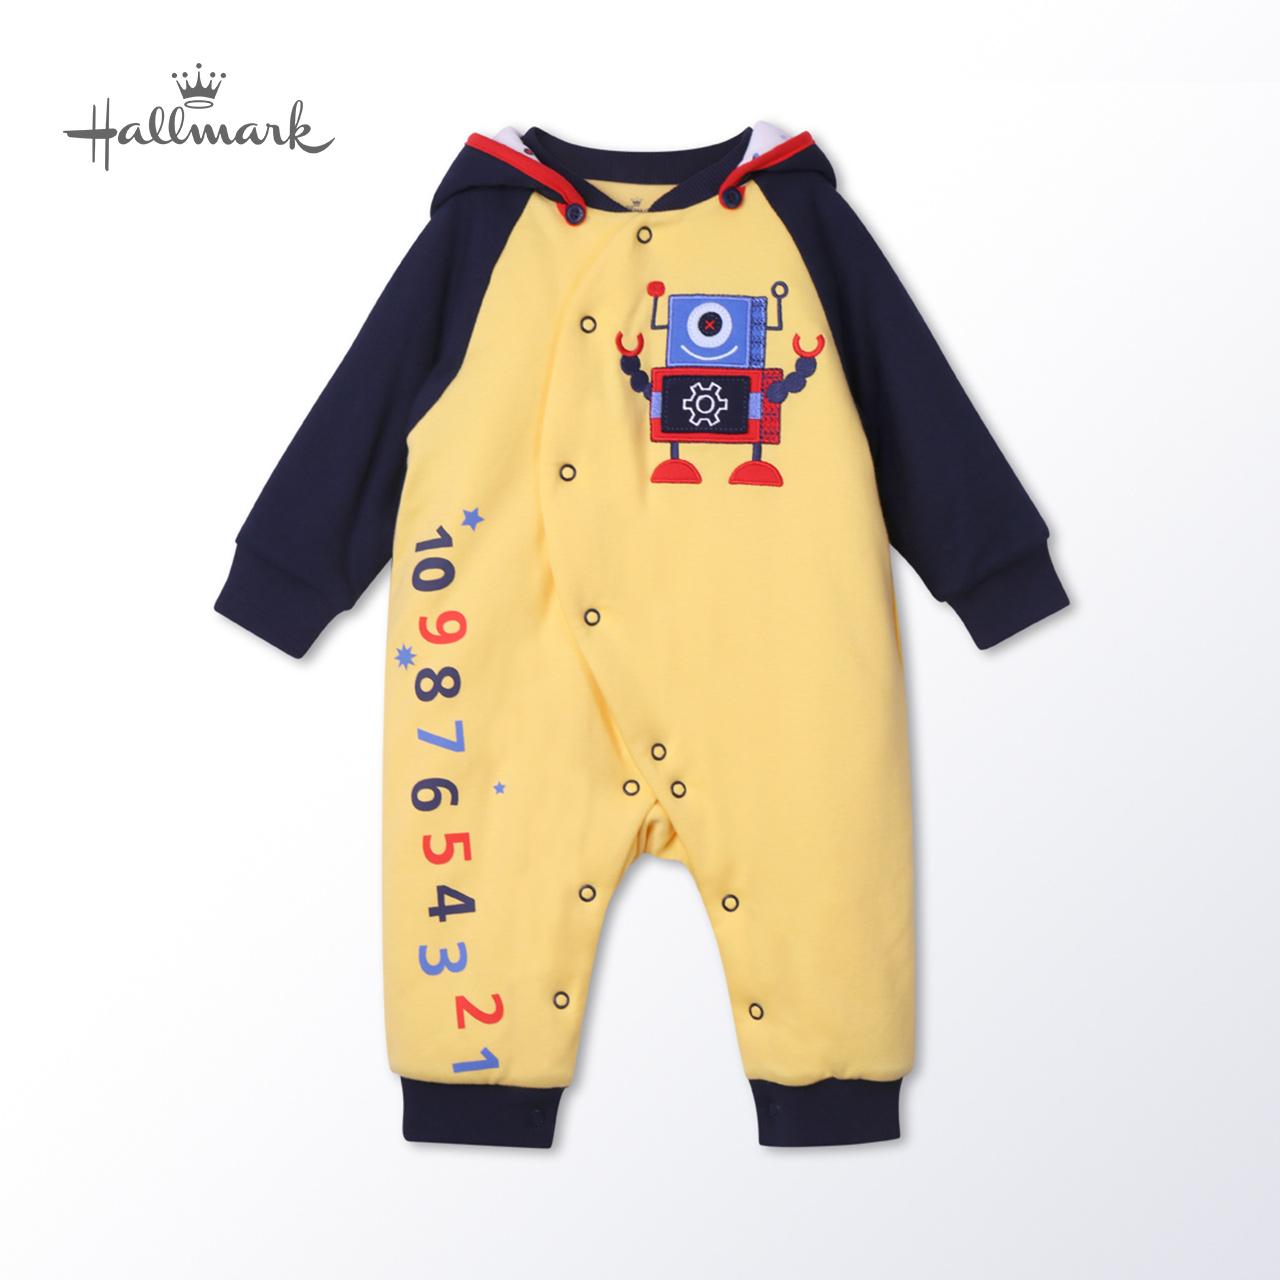 Hallmark贺曼2018秋装新款男婴宝宝婴儿纯棉夹棉连帽长袖连身衣